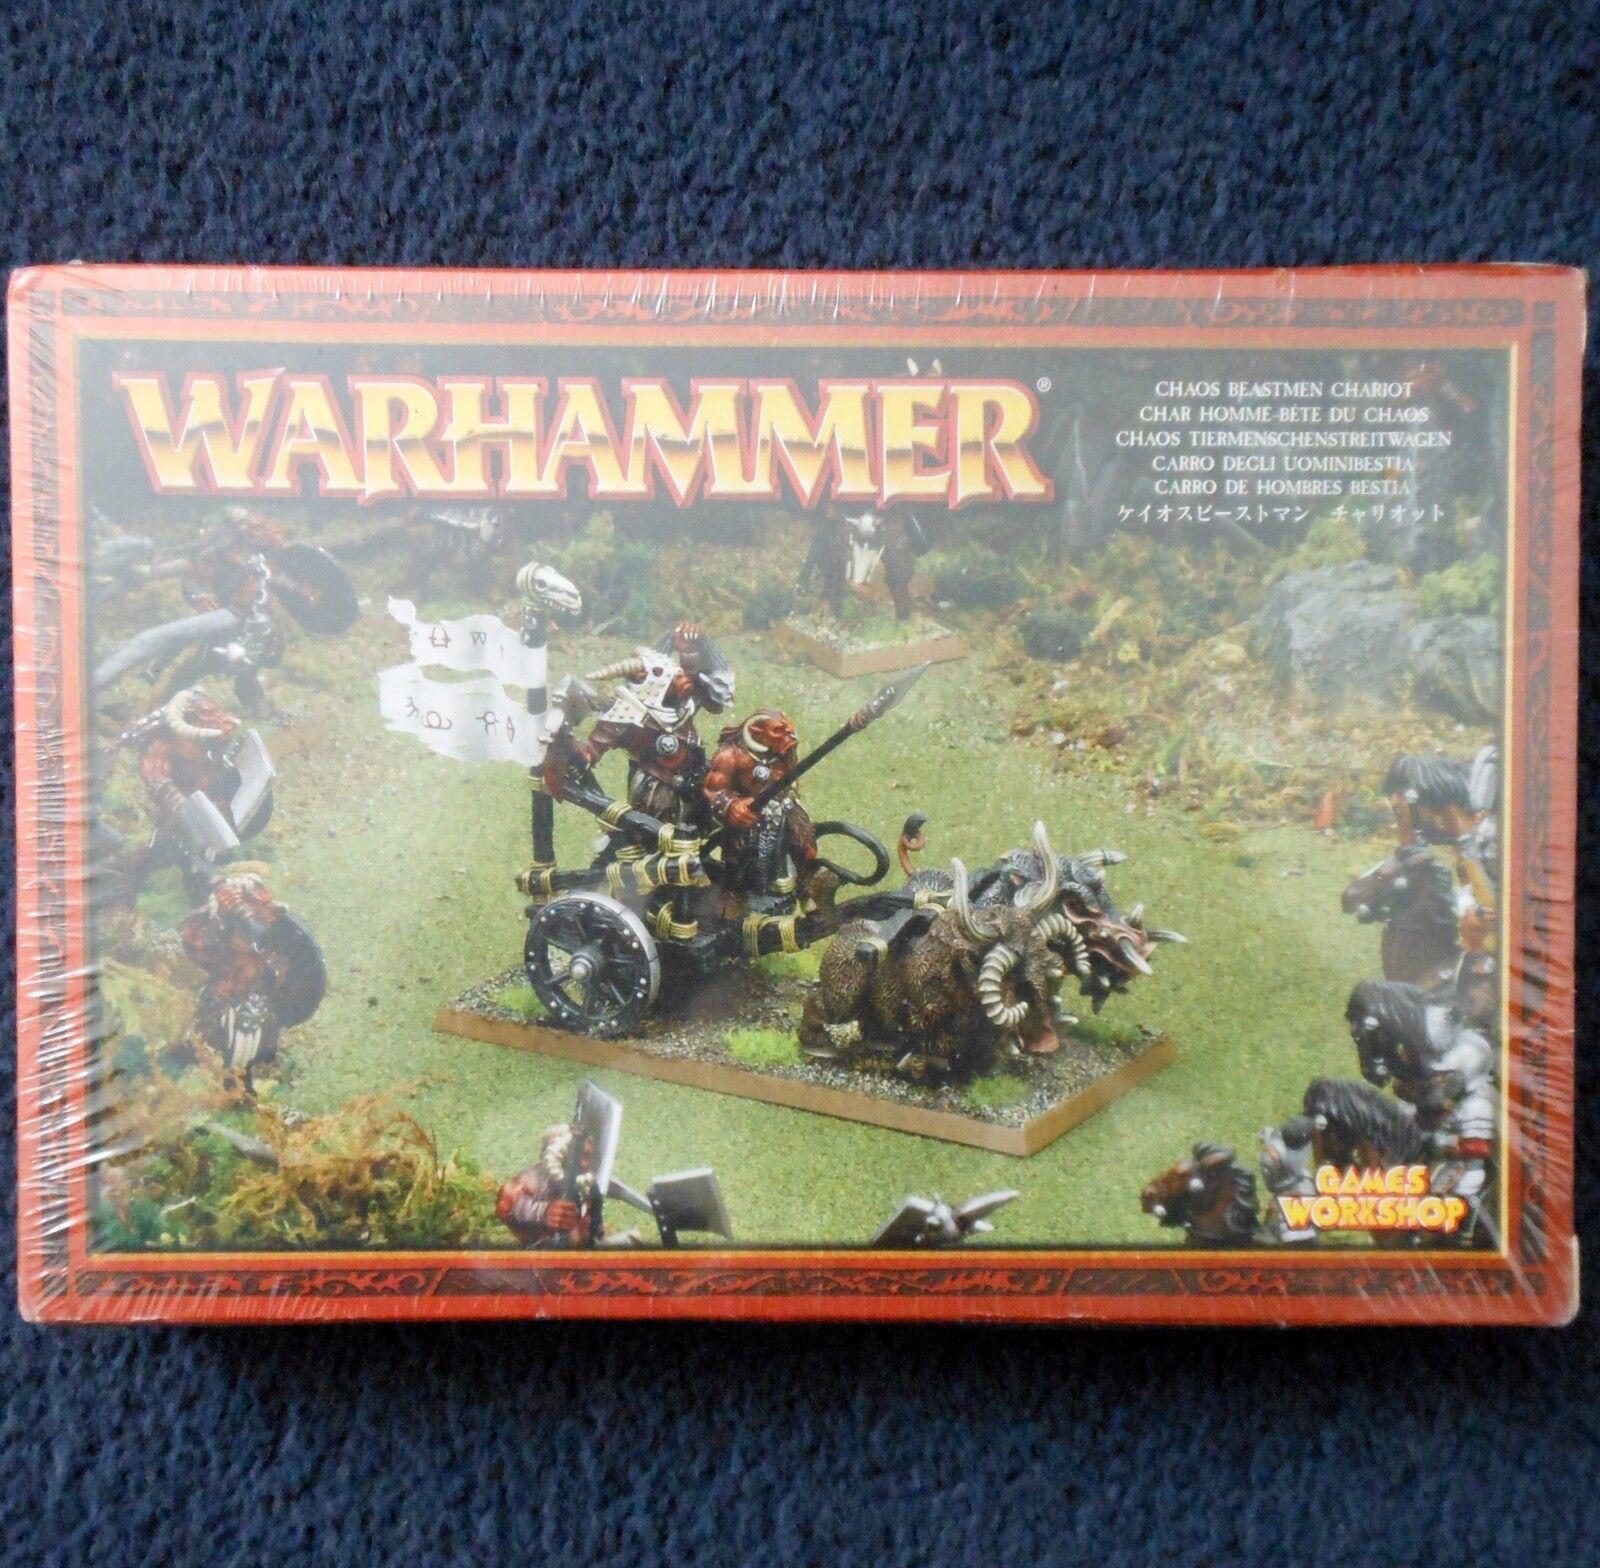 2003 Chaos Tuskgor Chariot Group Lords & Heroes Citadel Warhammer Beastmen MIB